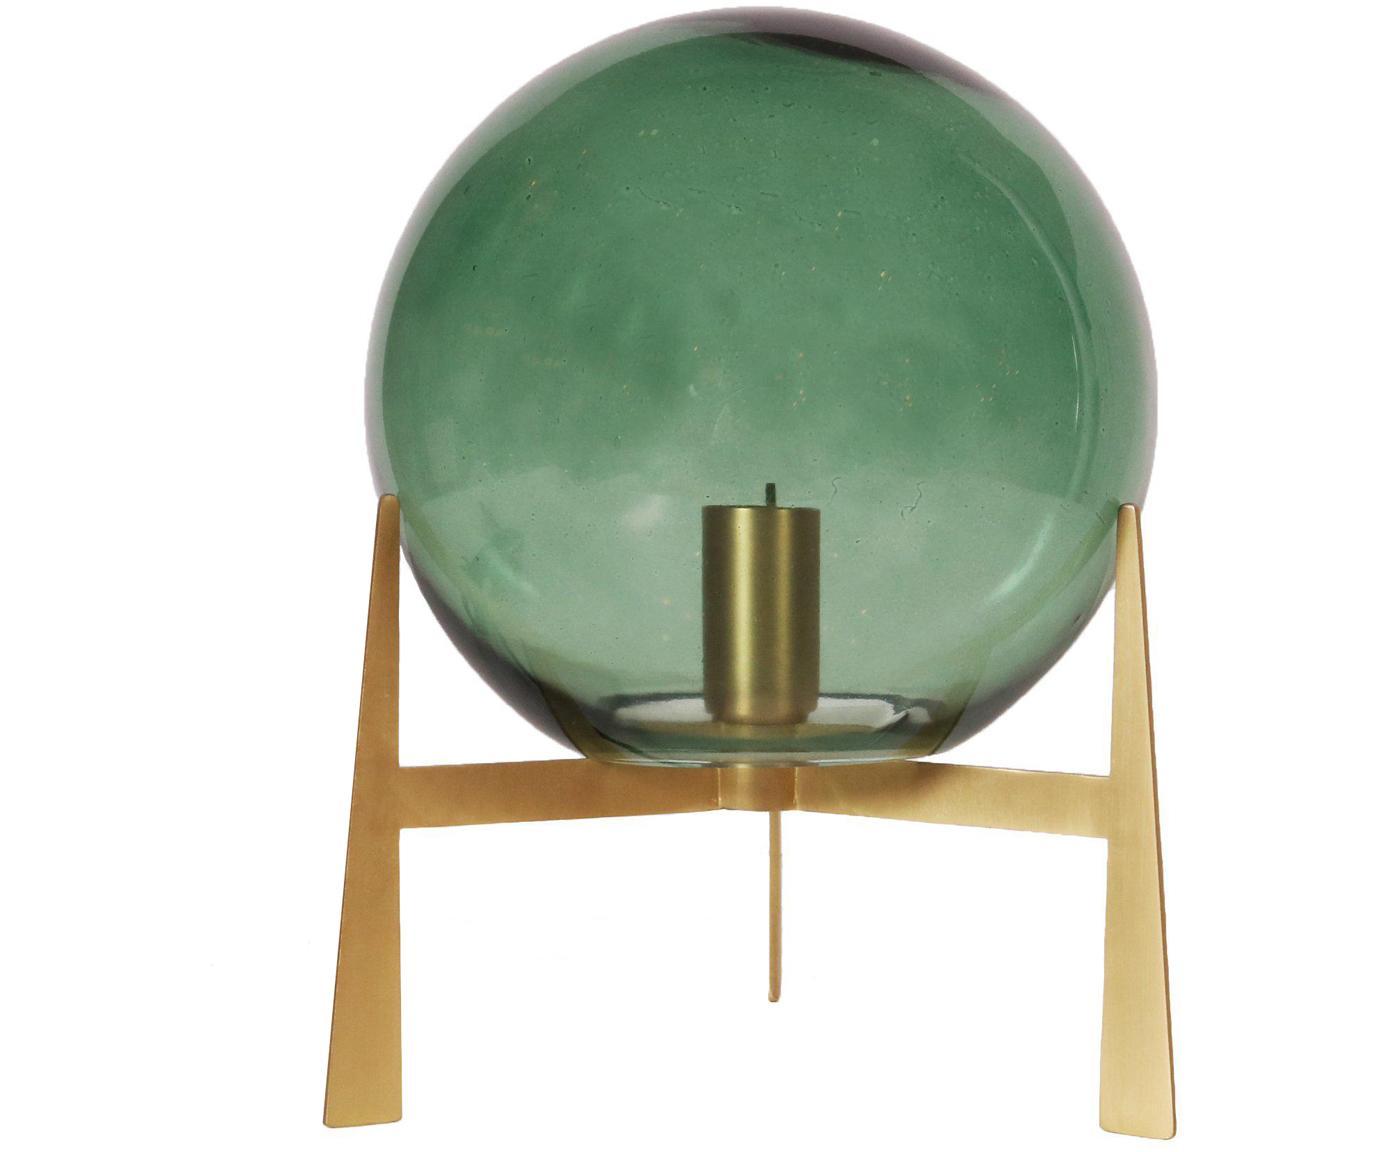 Tafellamp Milla, Lampenkap: glas, Lampvoet: messing, Groen, messingkleurig, zwart, Ø 22 x H 28 cm